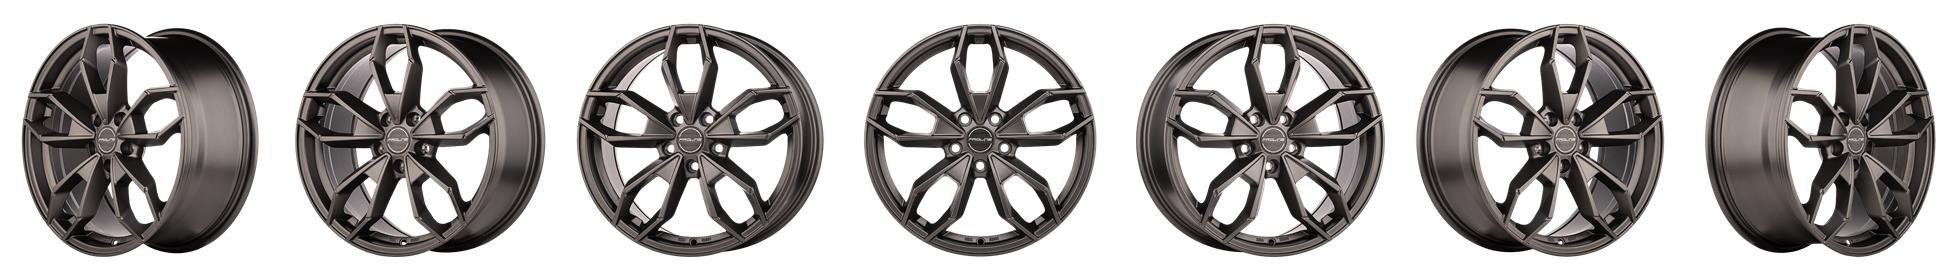 Jaguar Xk 20 Alloy Wheels Oponeoie